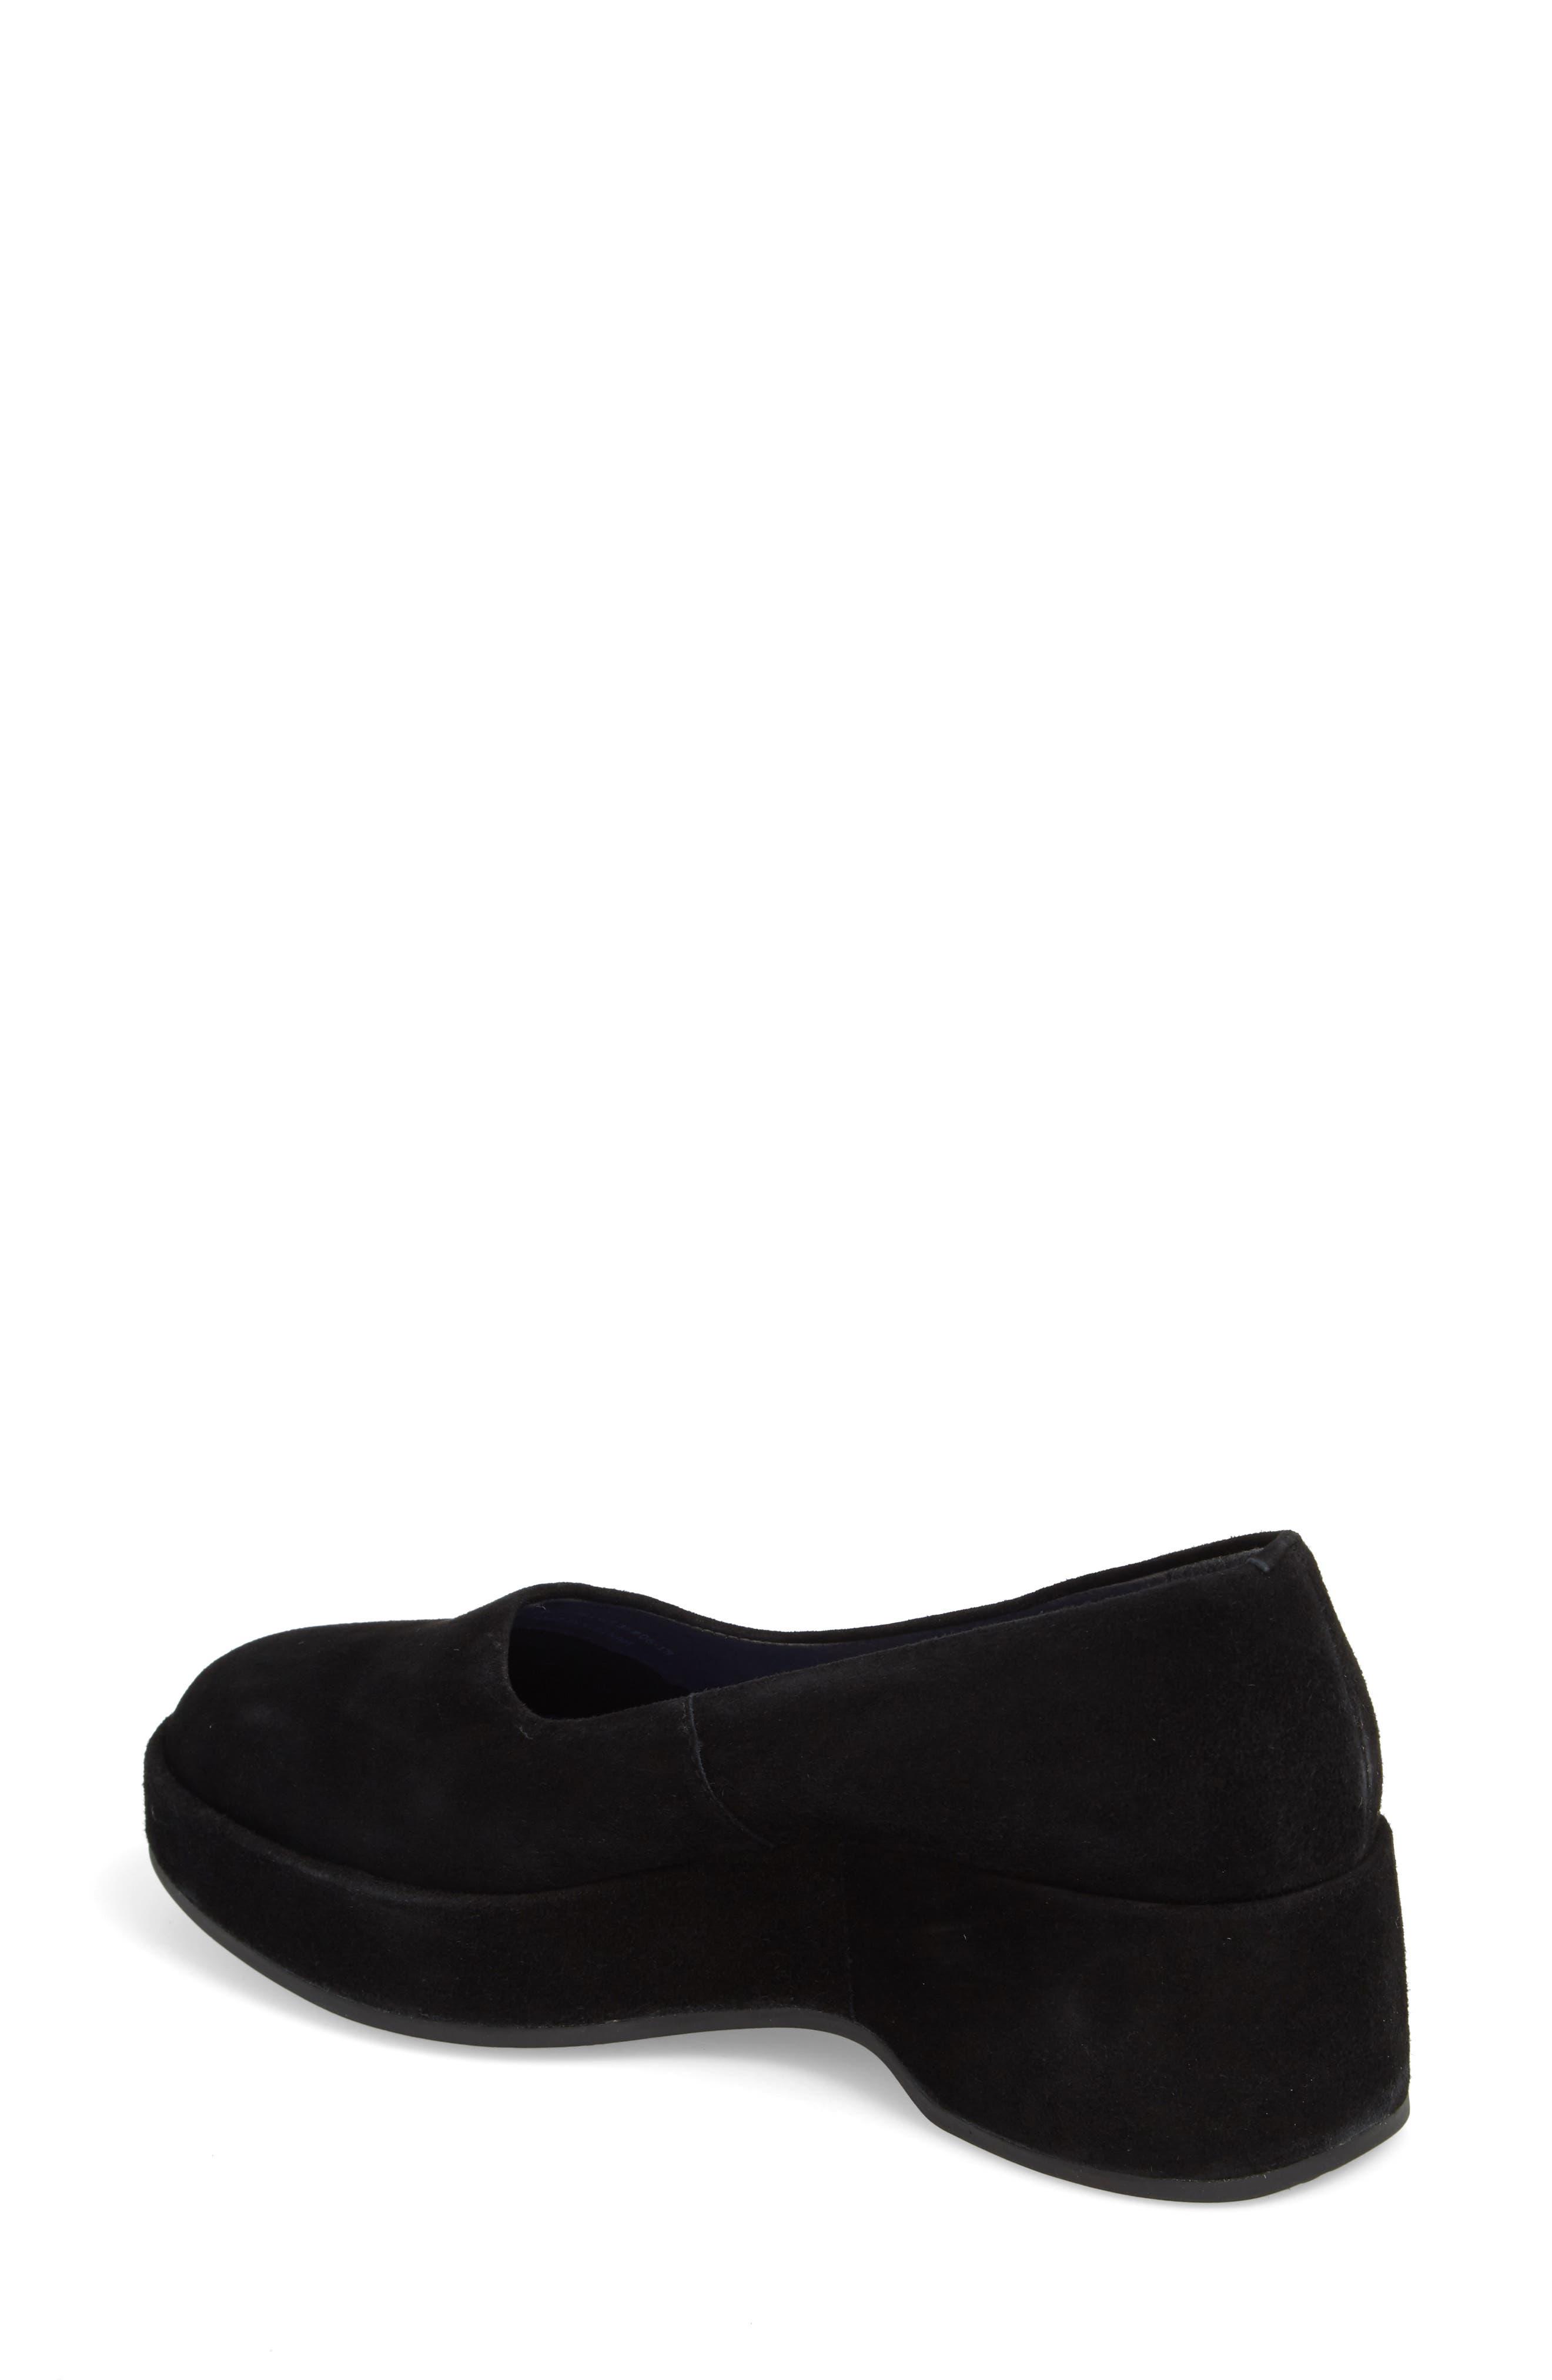 Sisea Platform Shoe,                             Alternate thumbnail 2, color,                             BLACK LEATHER